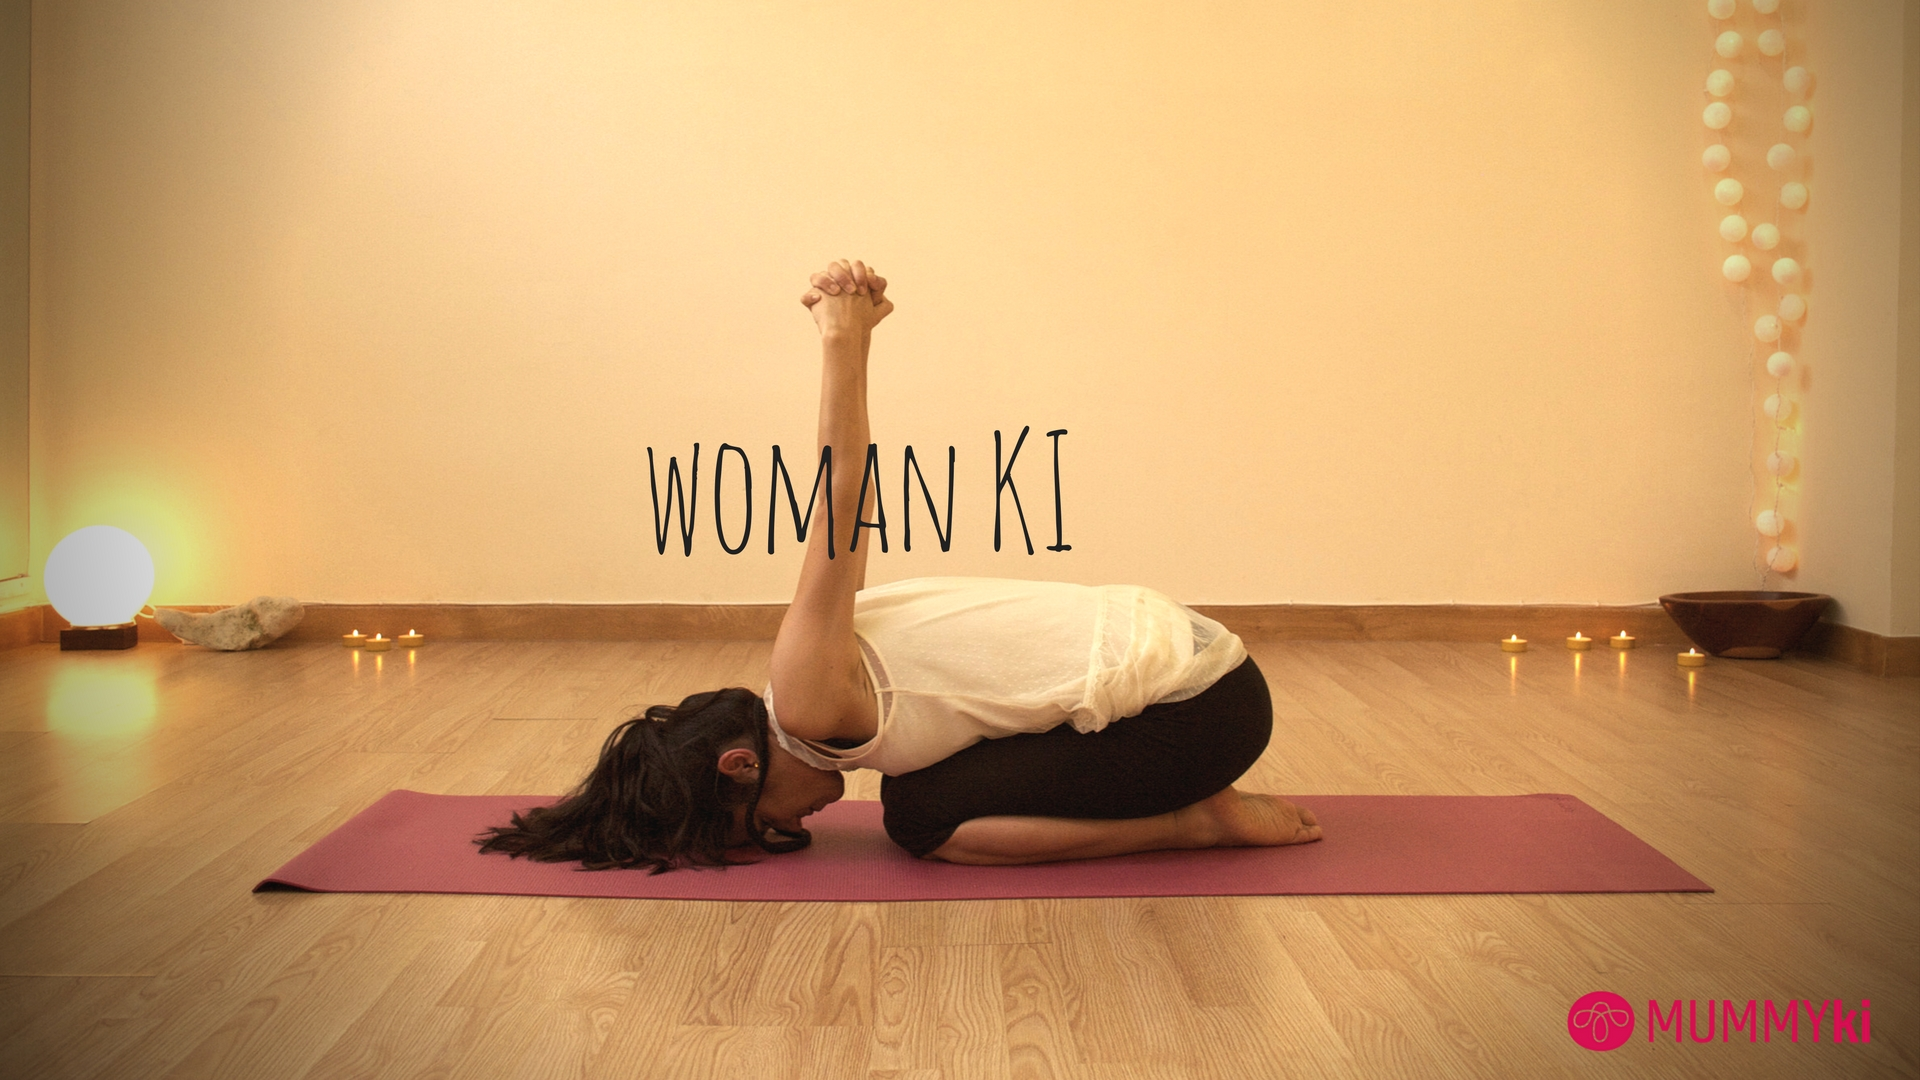 Anna Santos yoga para la mujer womanki